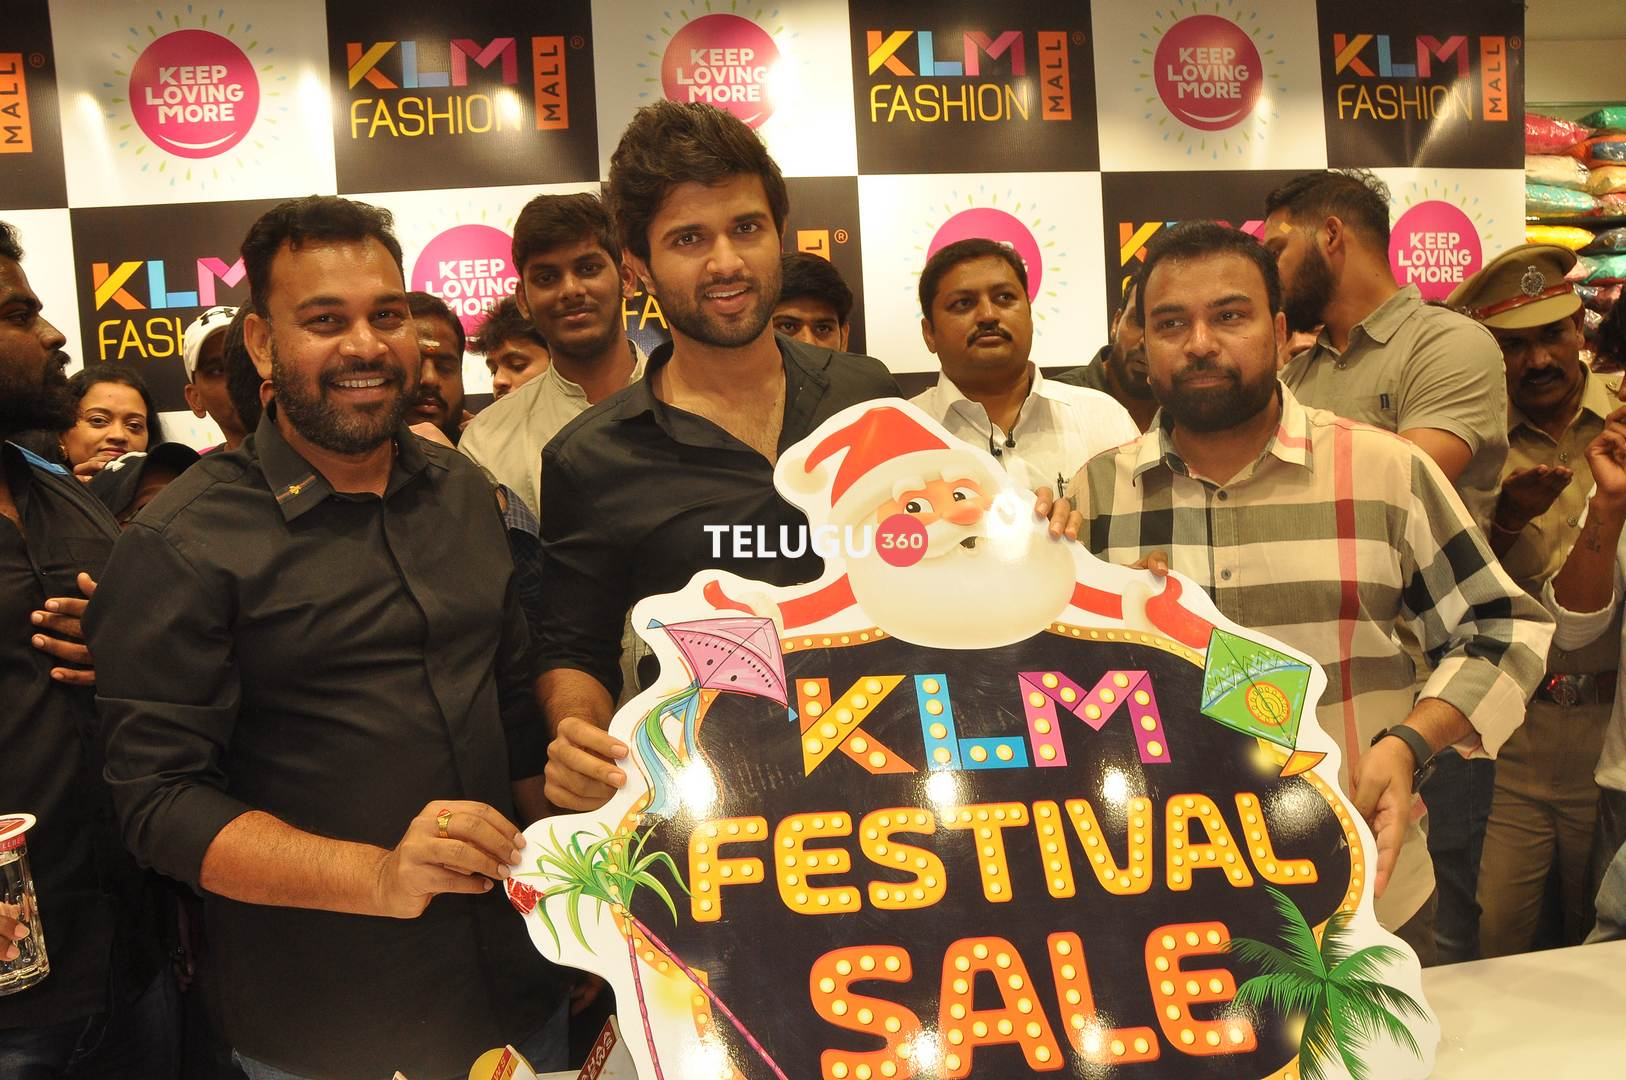 Vijaydevarakonda KLM rajamundry visit.. spl festival offers launch